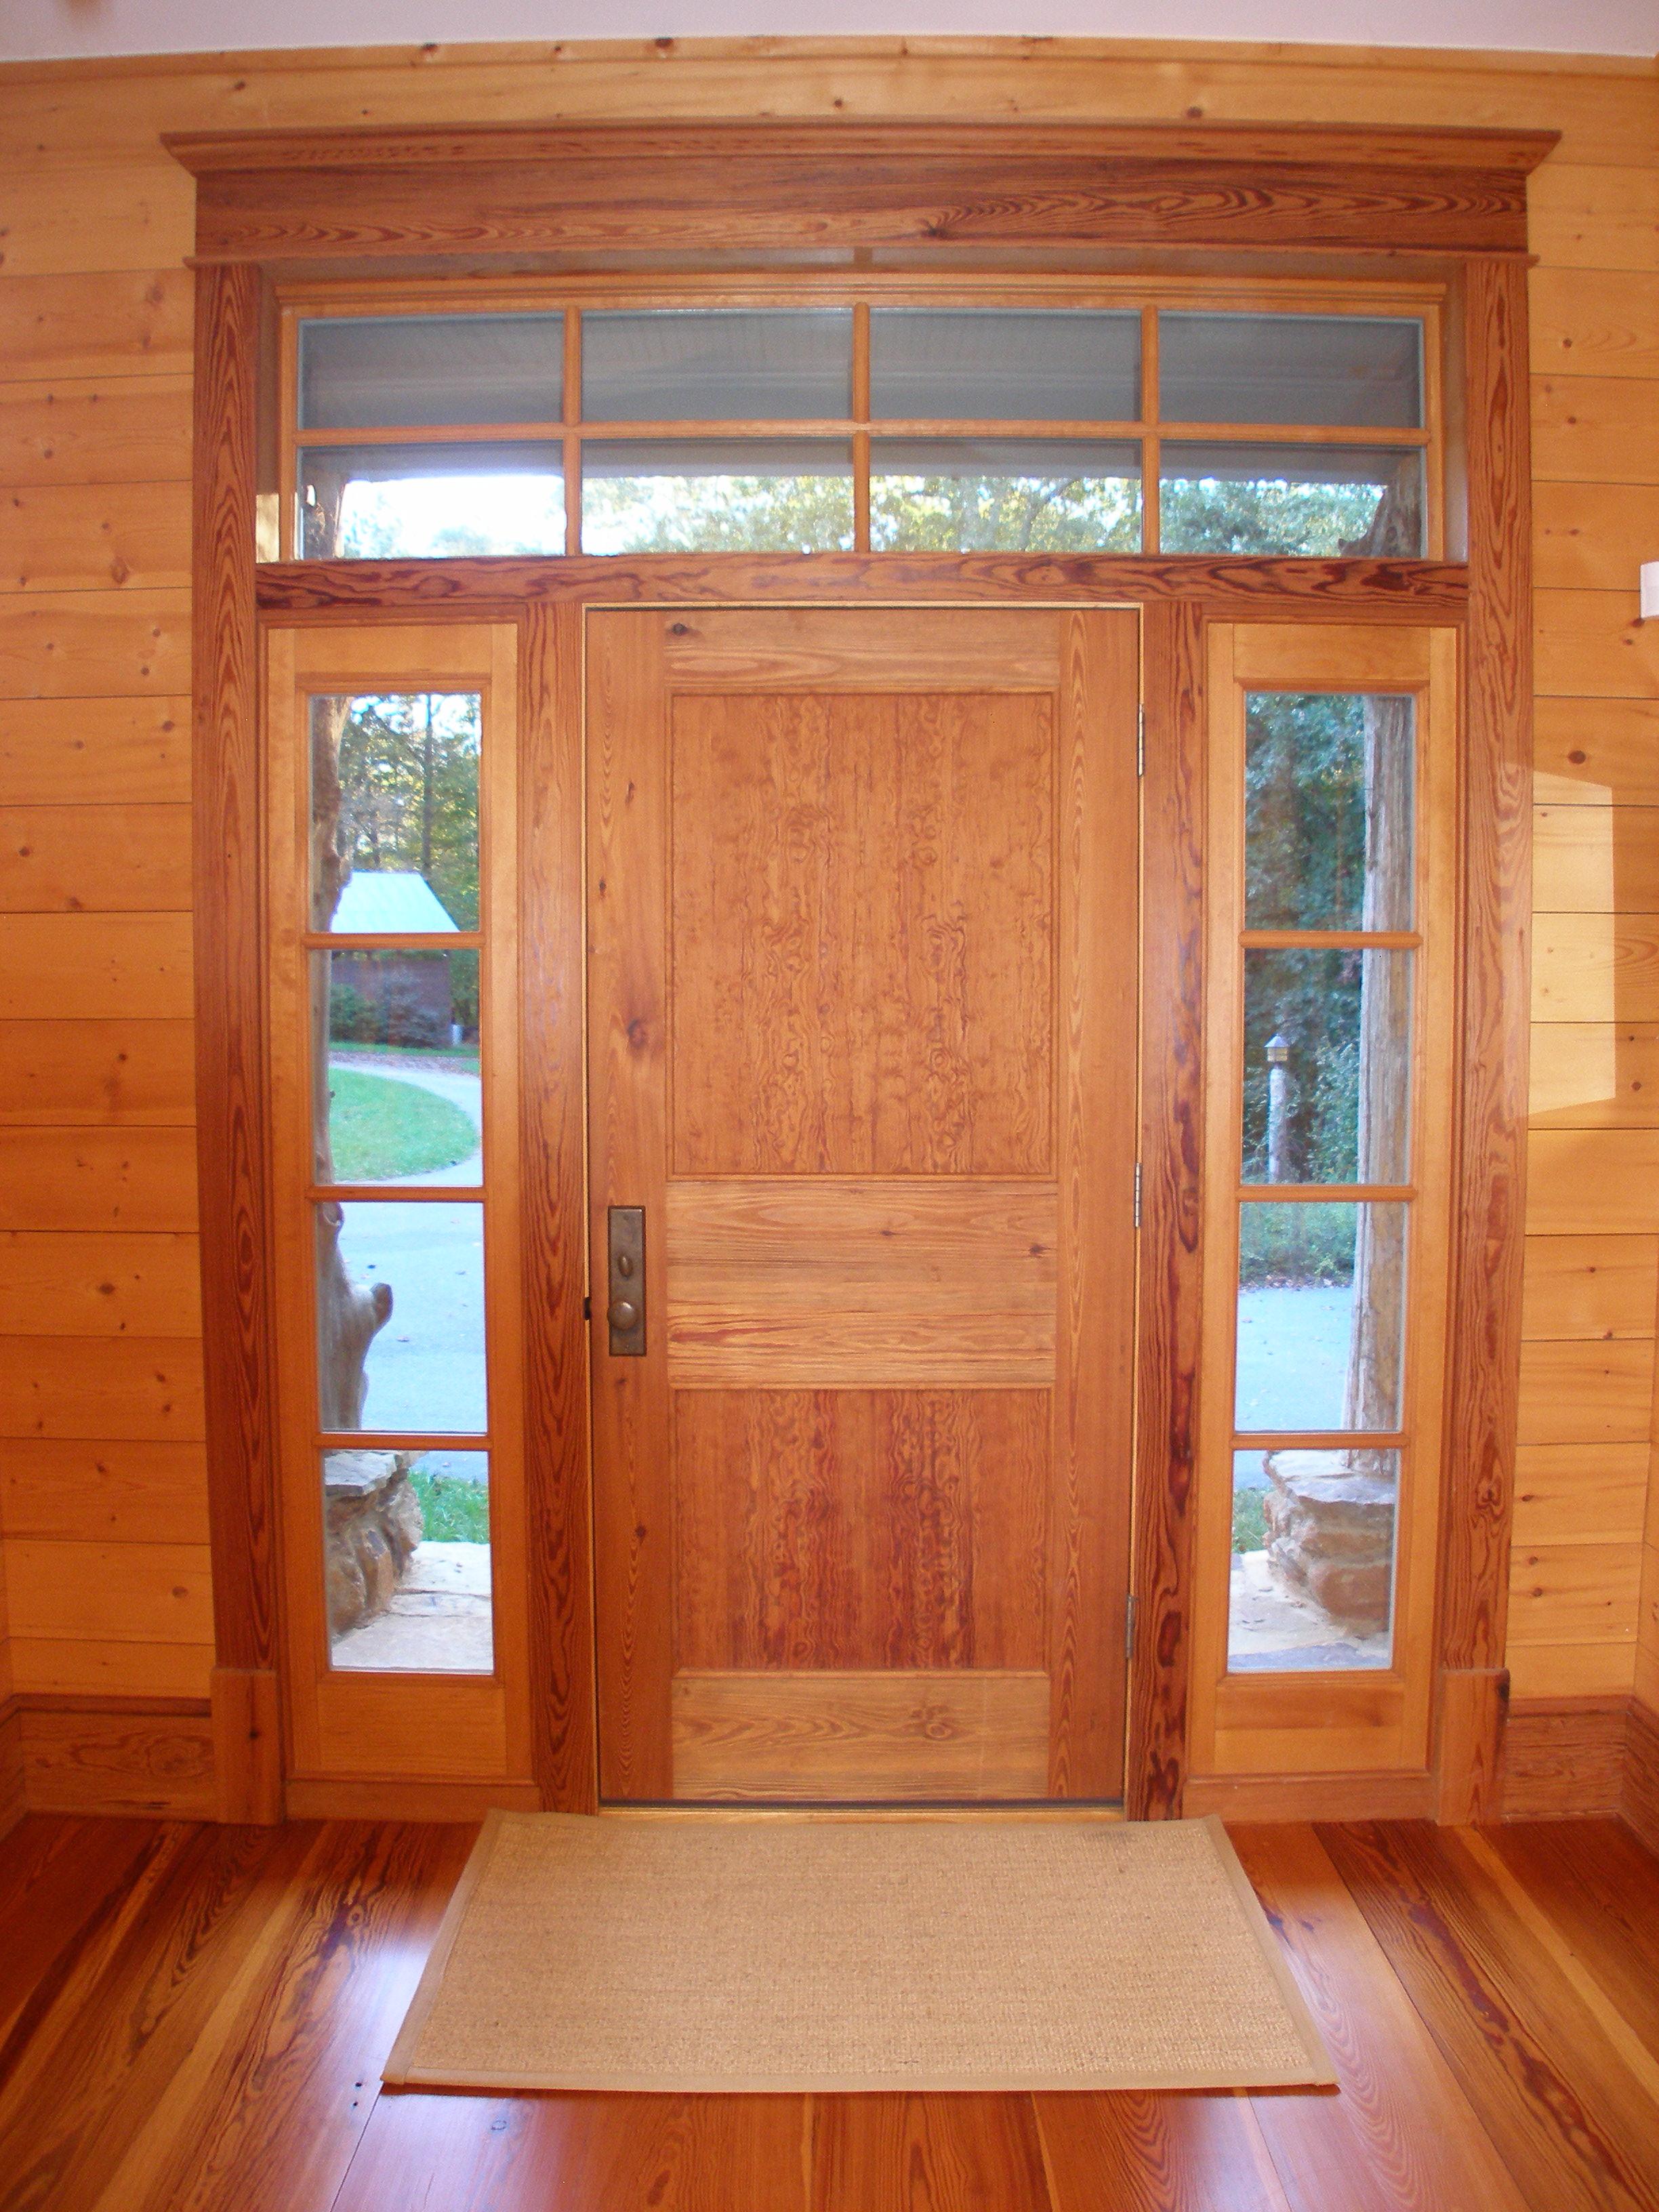 Inside of entrance door shows interior panel arrangement of curly pine panels.